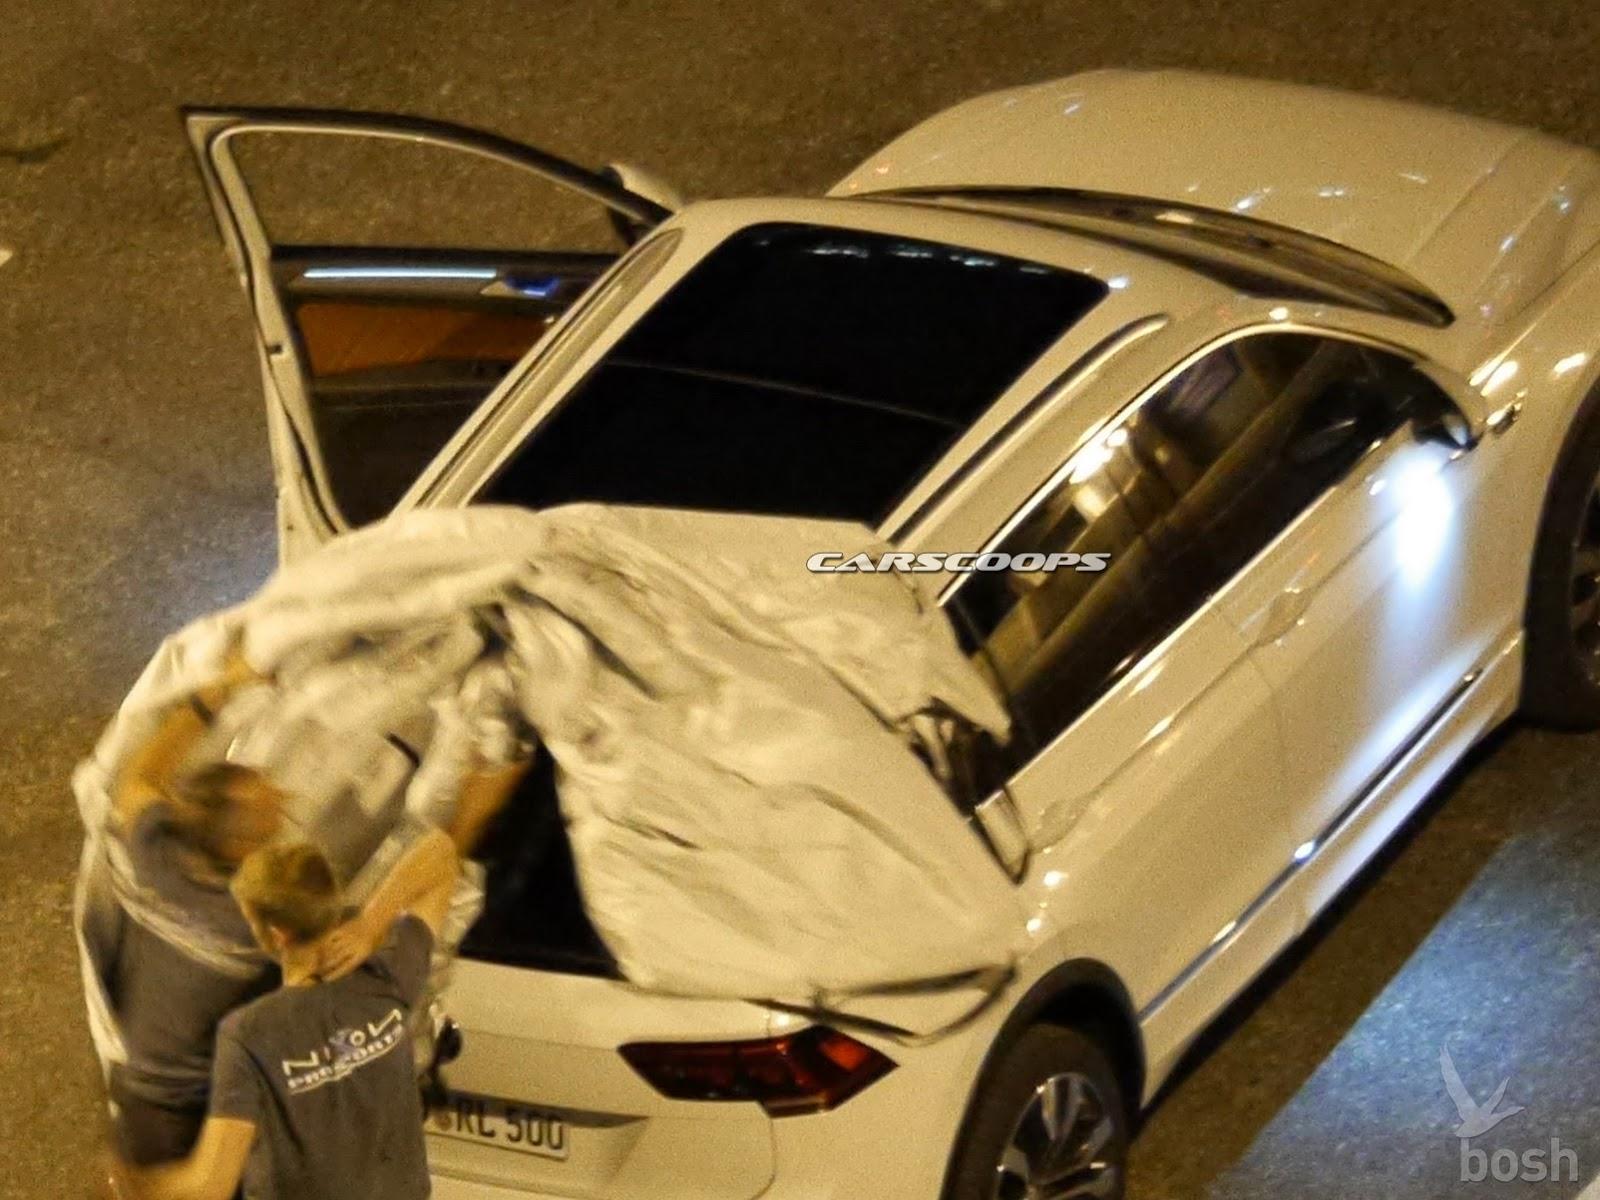 ... Frankfurt Motor Show New Cars Scoops U Spy VW VW Scoops VW Tiguan